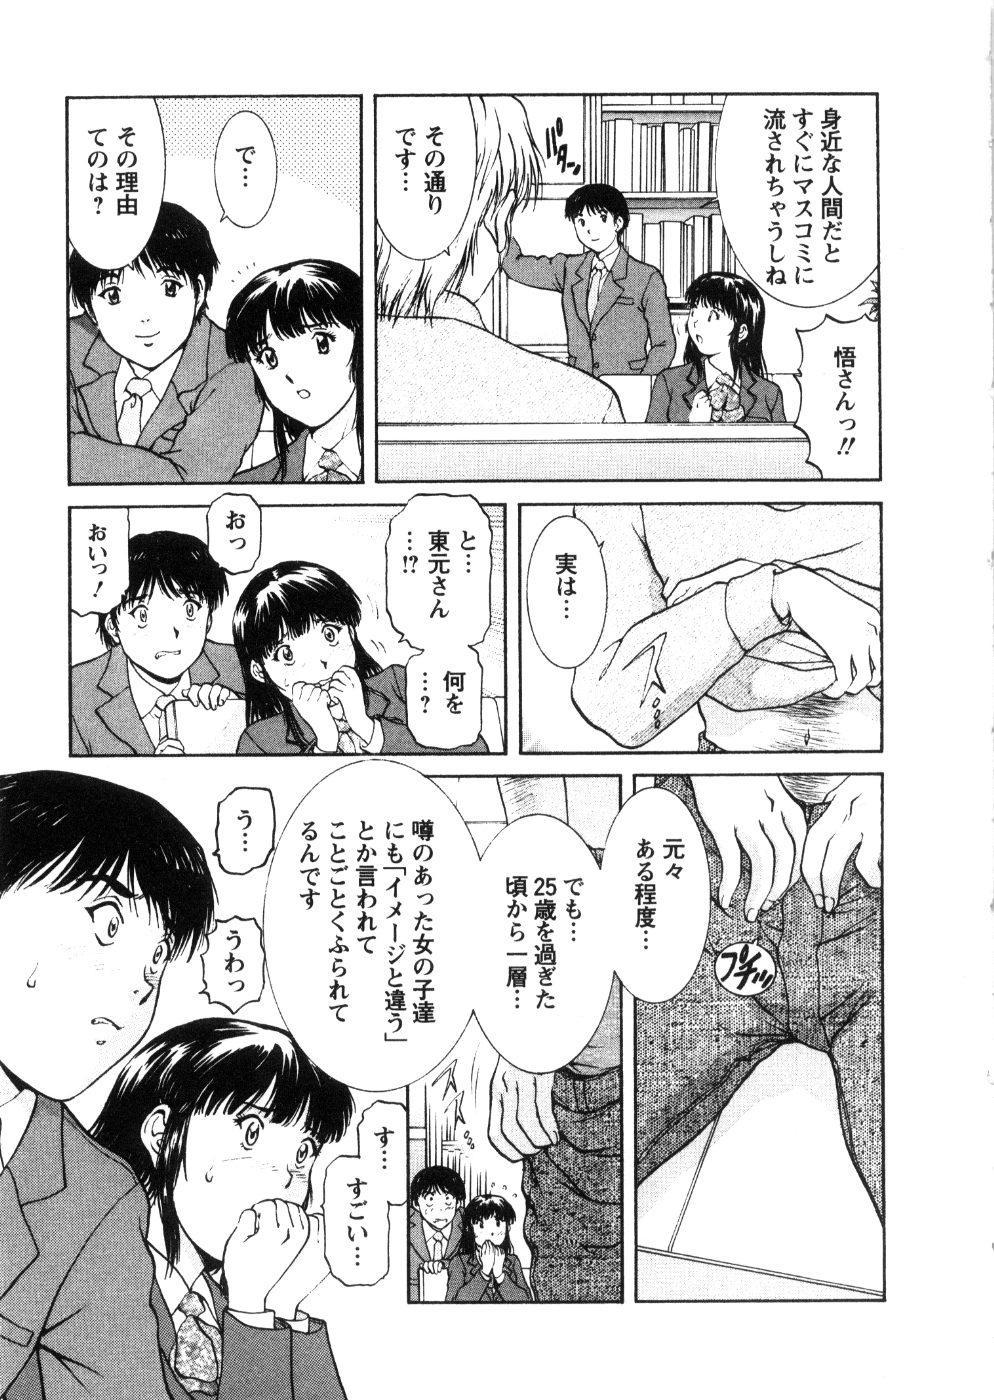 Oneechan-tachi ga Yatte Kuru 03 158